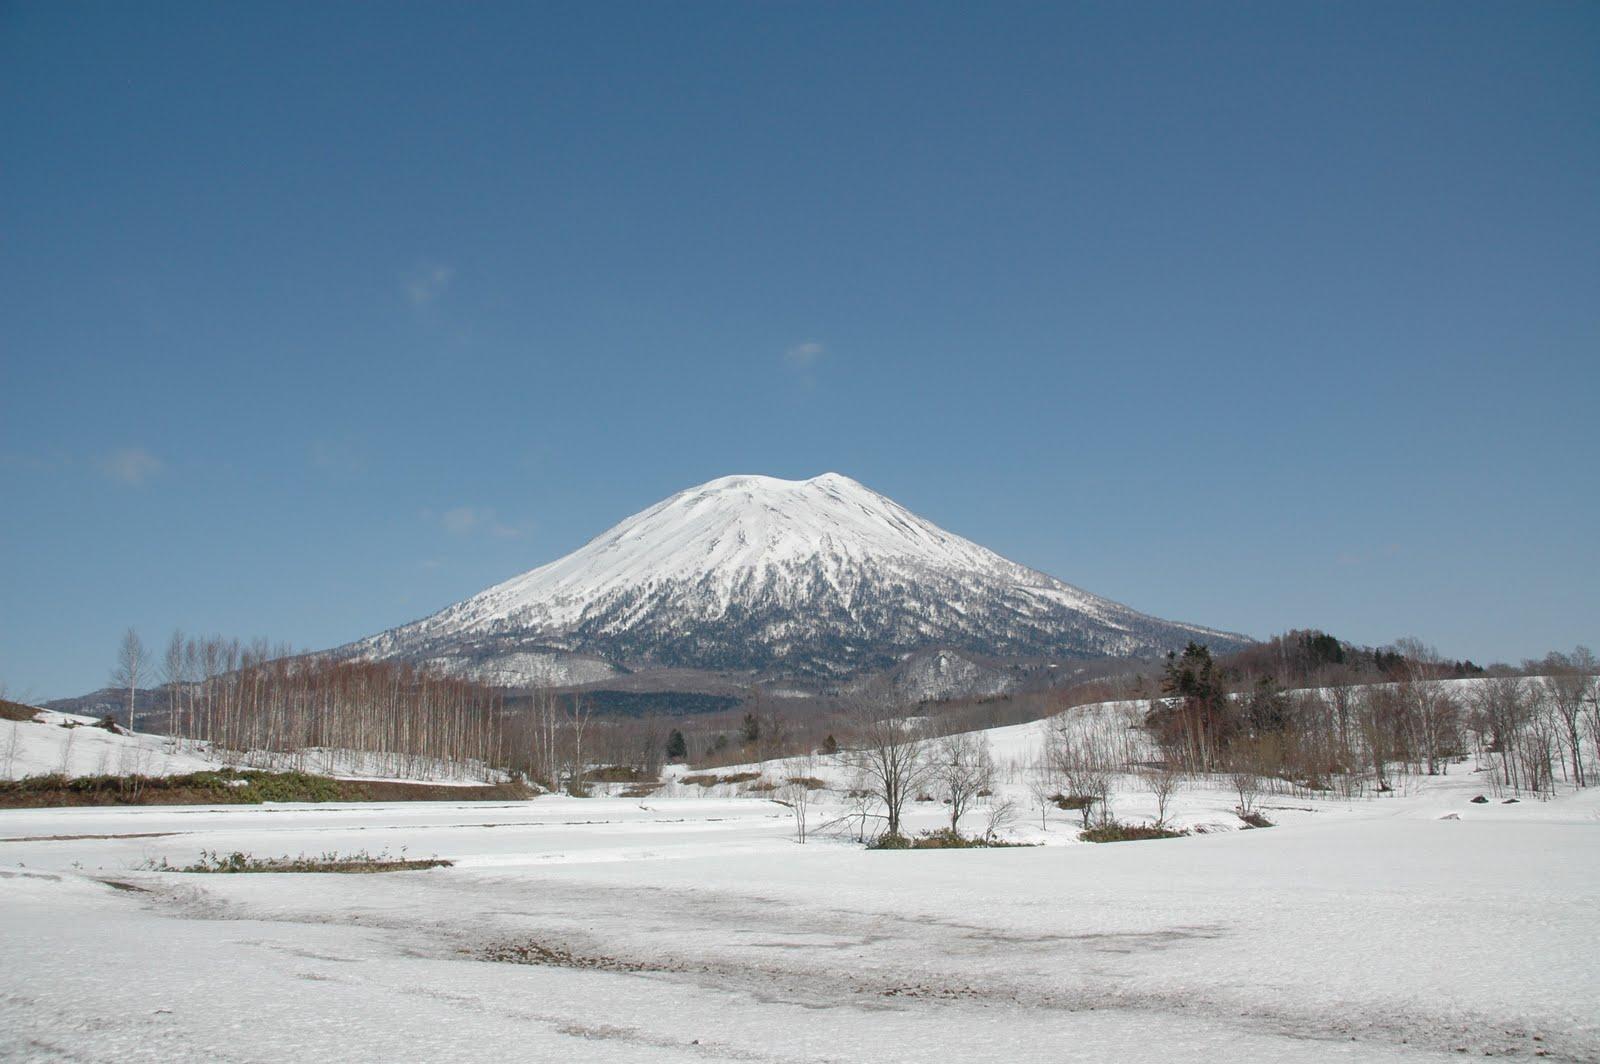 Mt_Youtei_Hokkaido_Japan.jpg